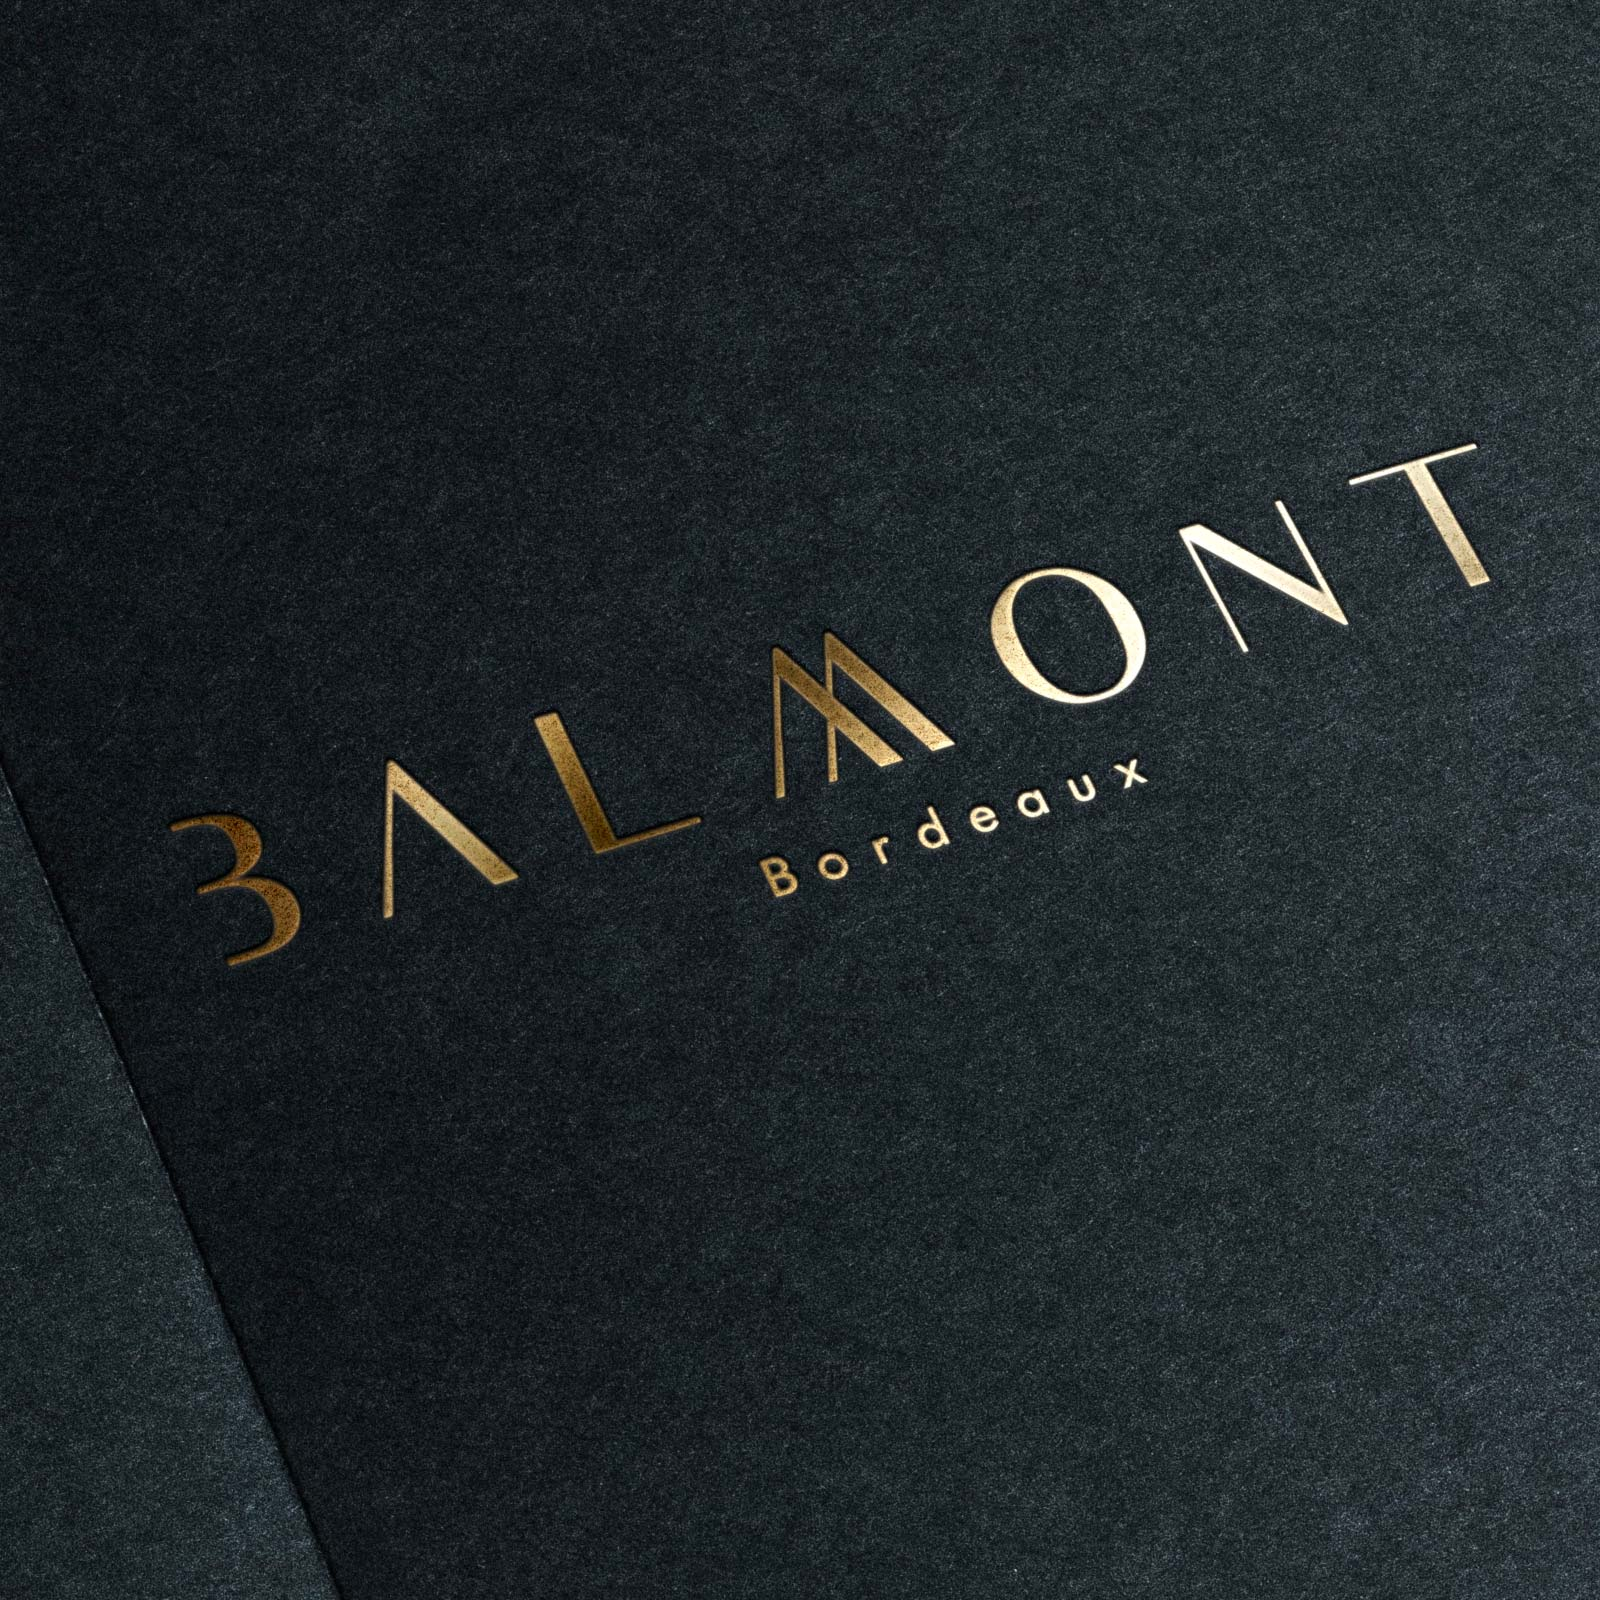 Balmont portfolio - LISAA